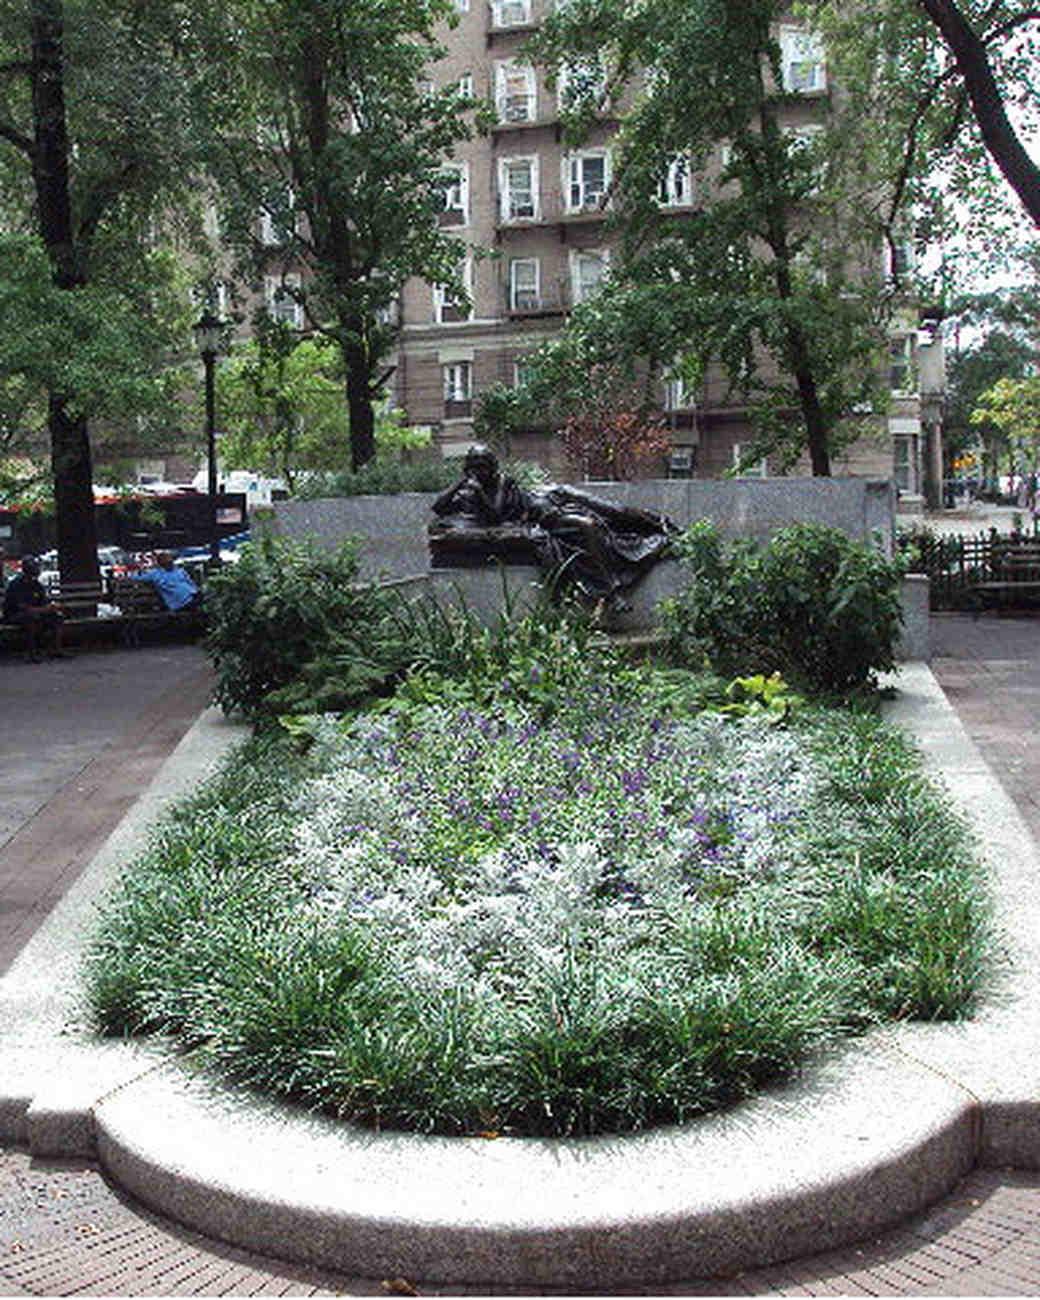 nyc-proposal-spots-straus-park-0316.jpg